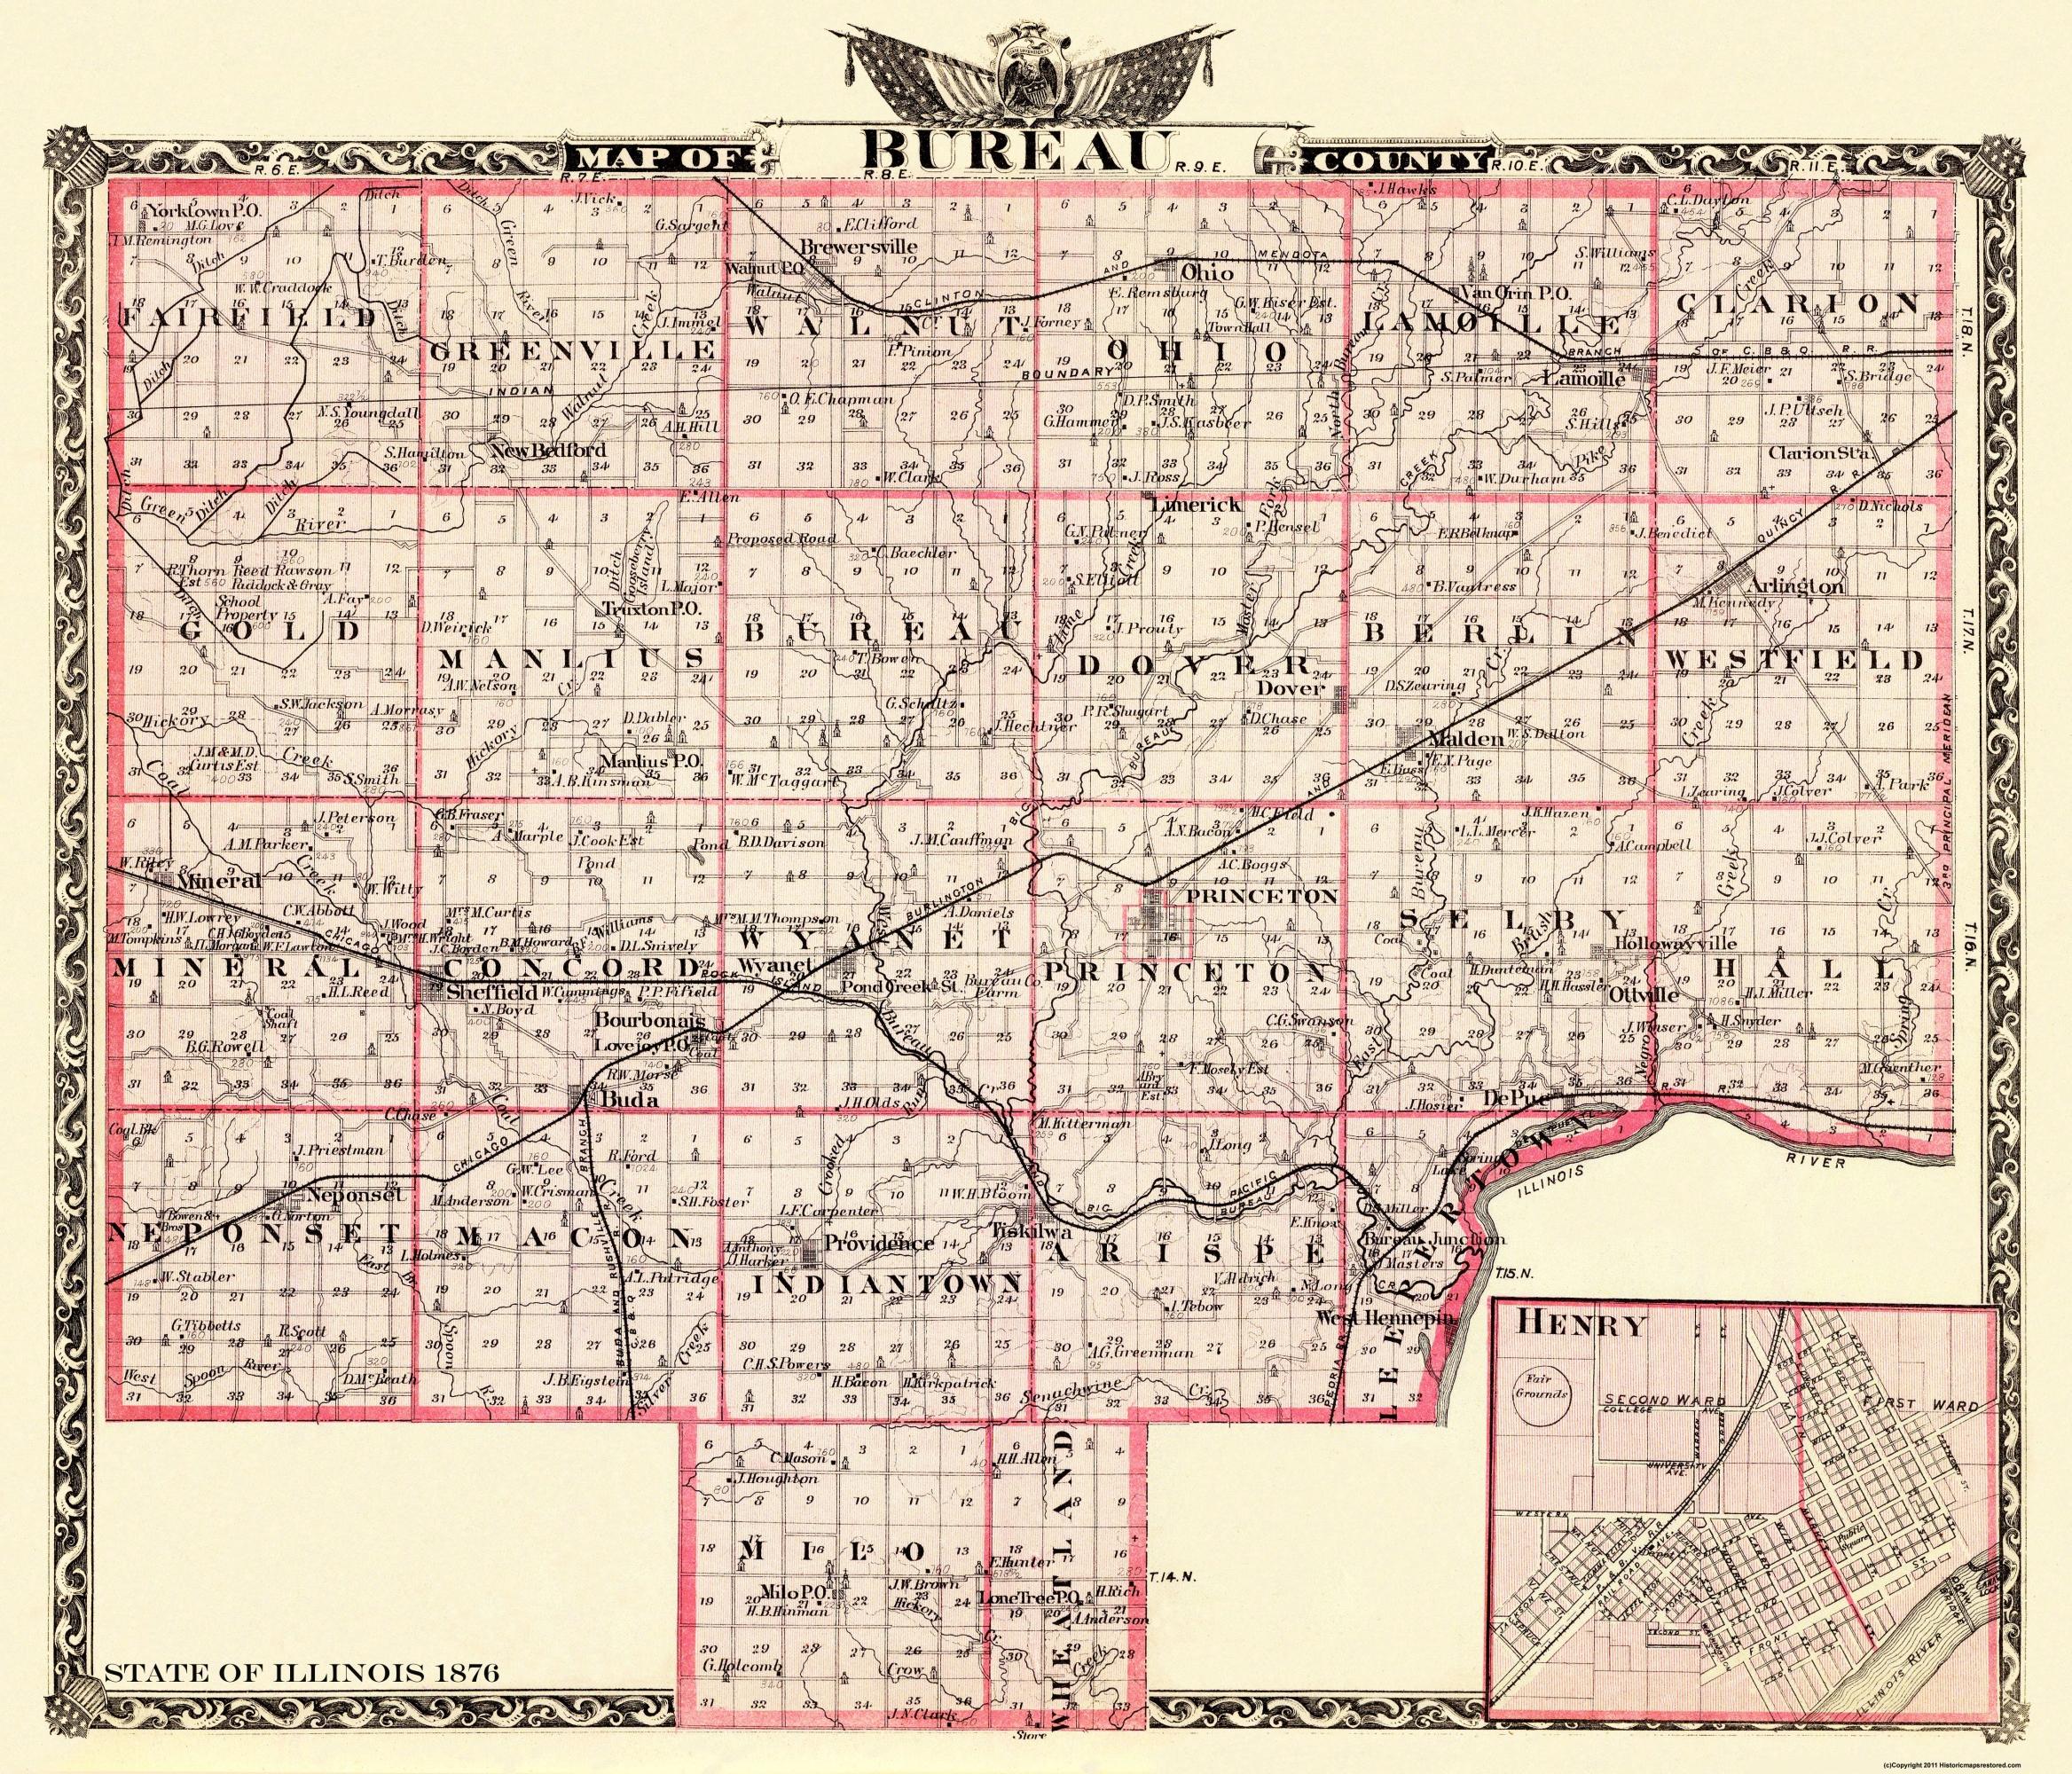 Illinois bureau county dover - Hover To Zoom